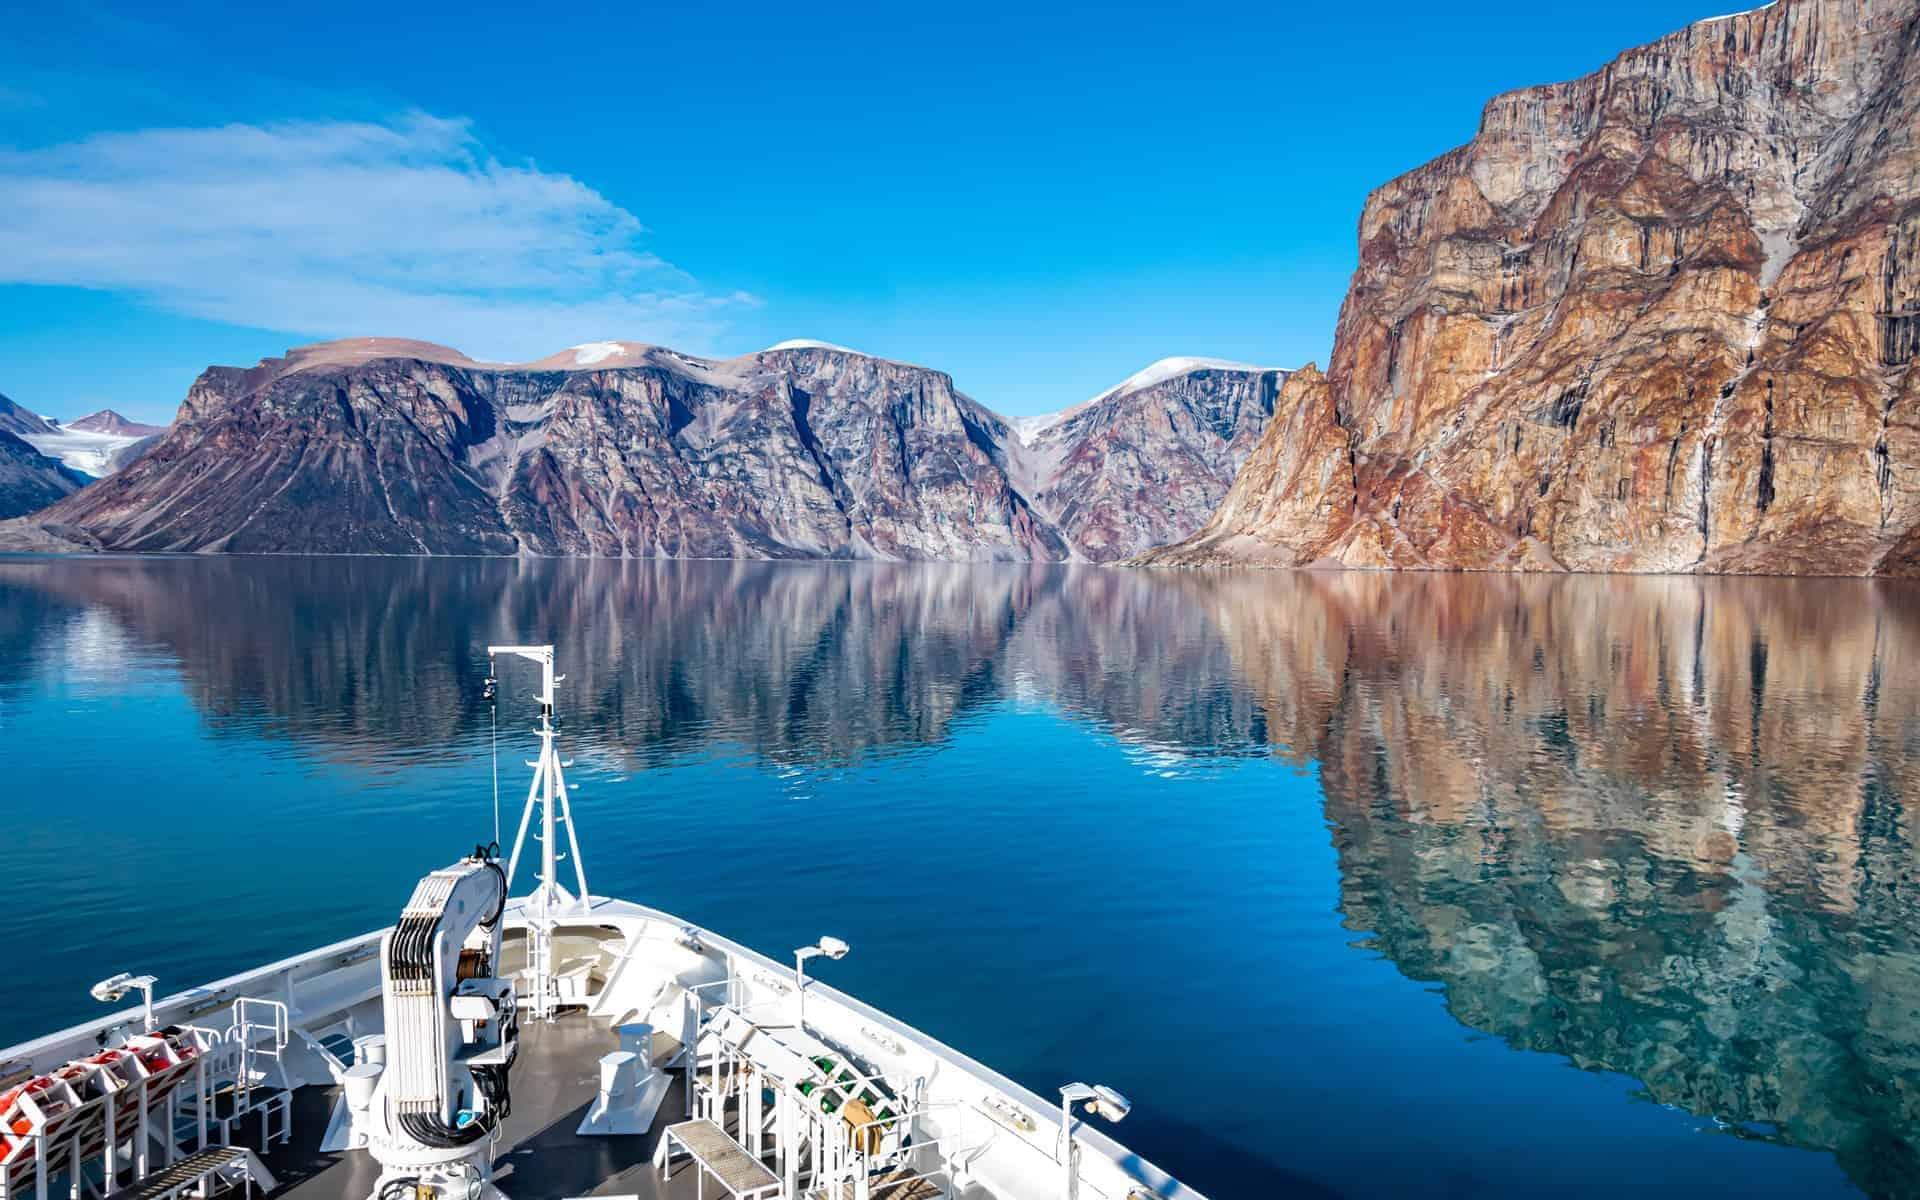 Baffin Island Canada. Expedition cruise ship in Sam Ford Fjord, Baffin sea, Arctic Canada, Nunavut